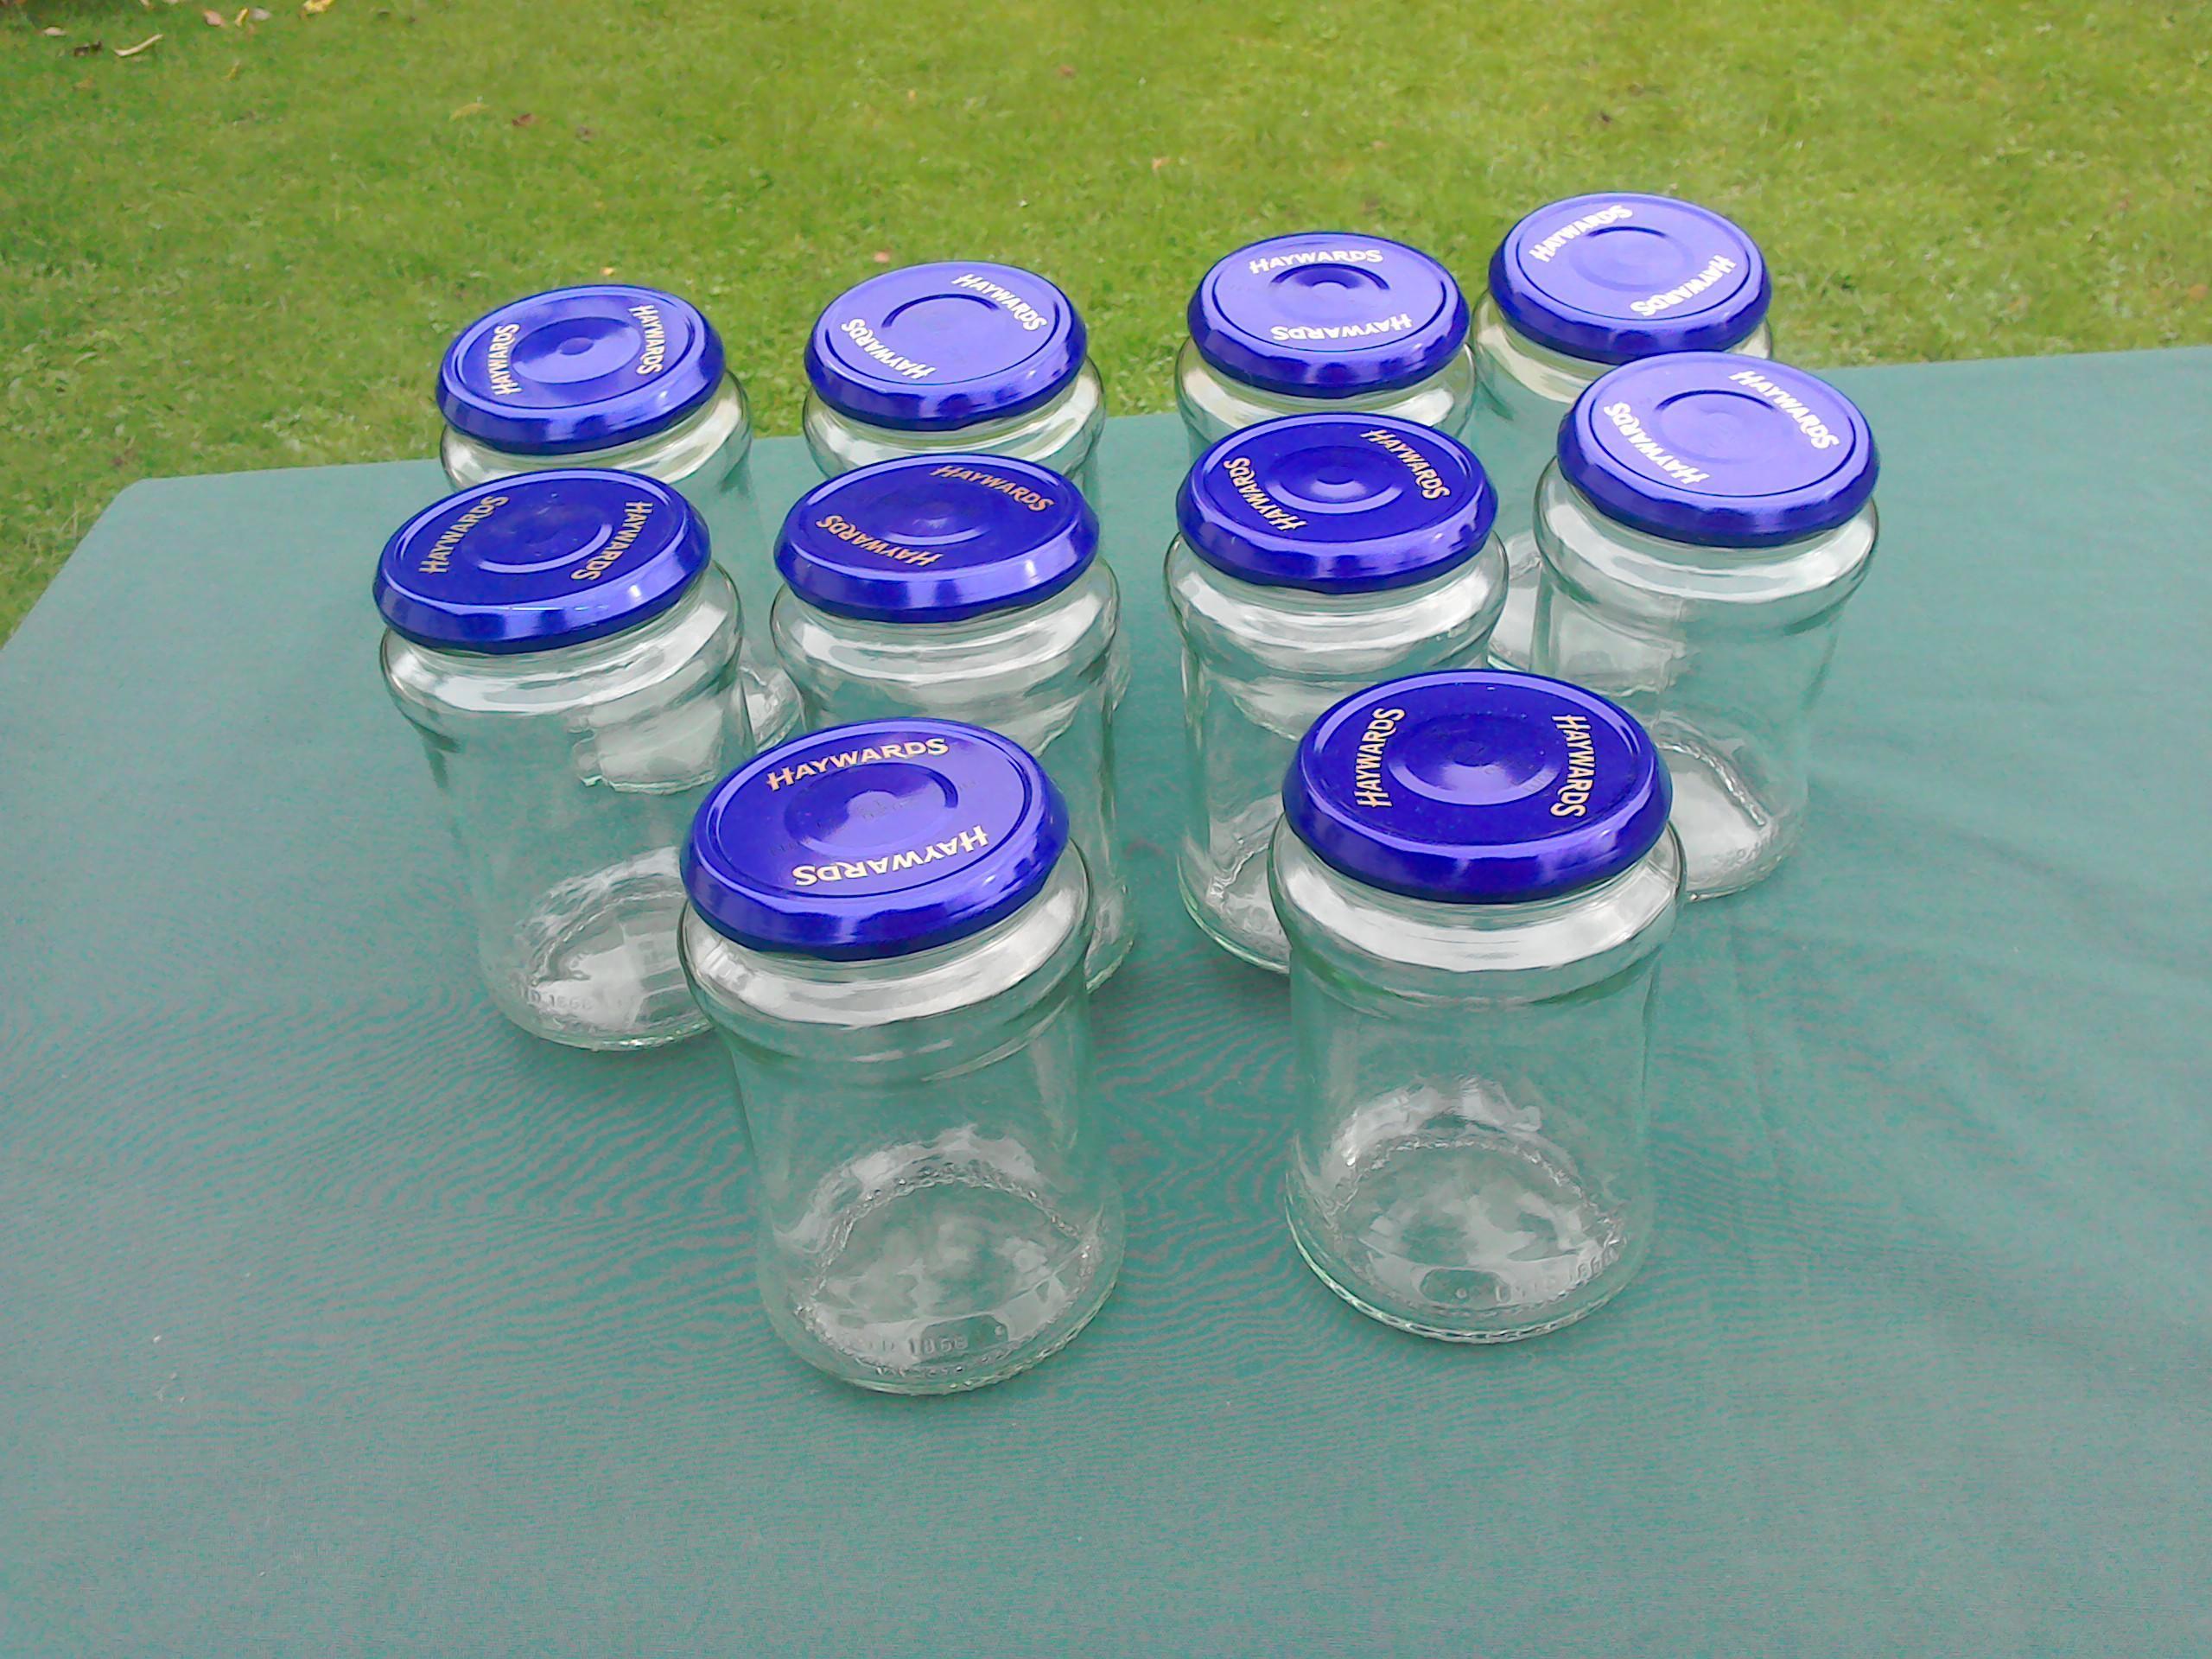 Jars x 10, for preserves (pickles, jams etc). 1LB size ish.